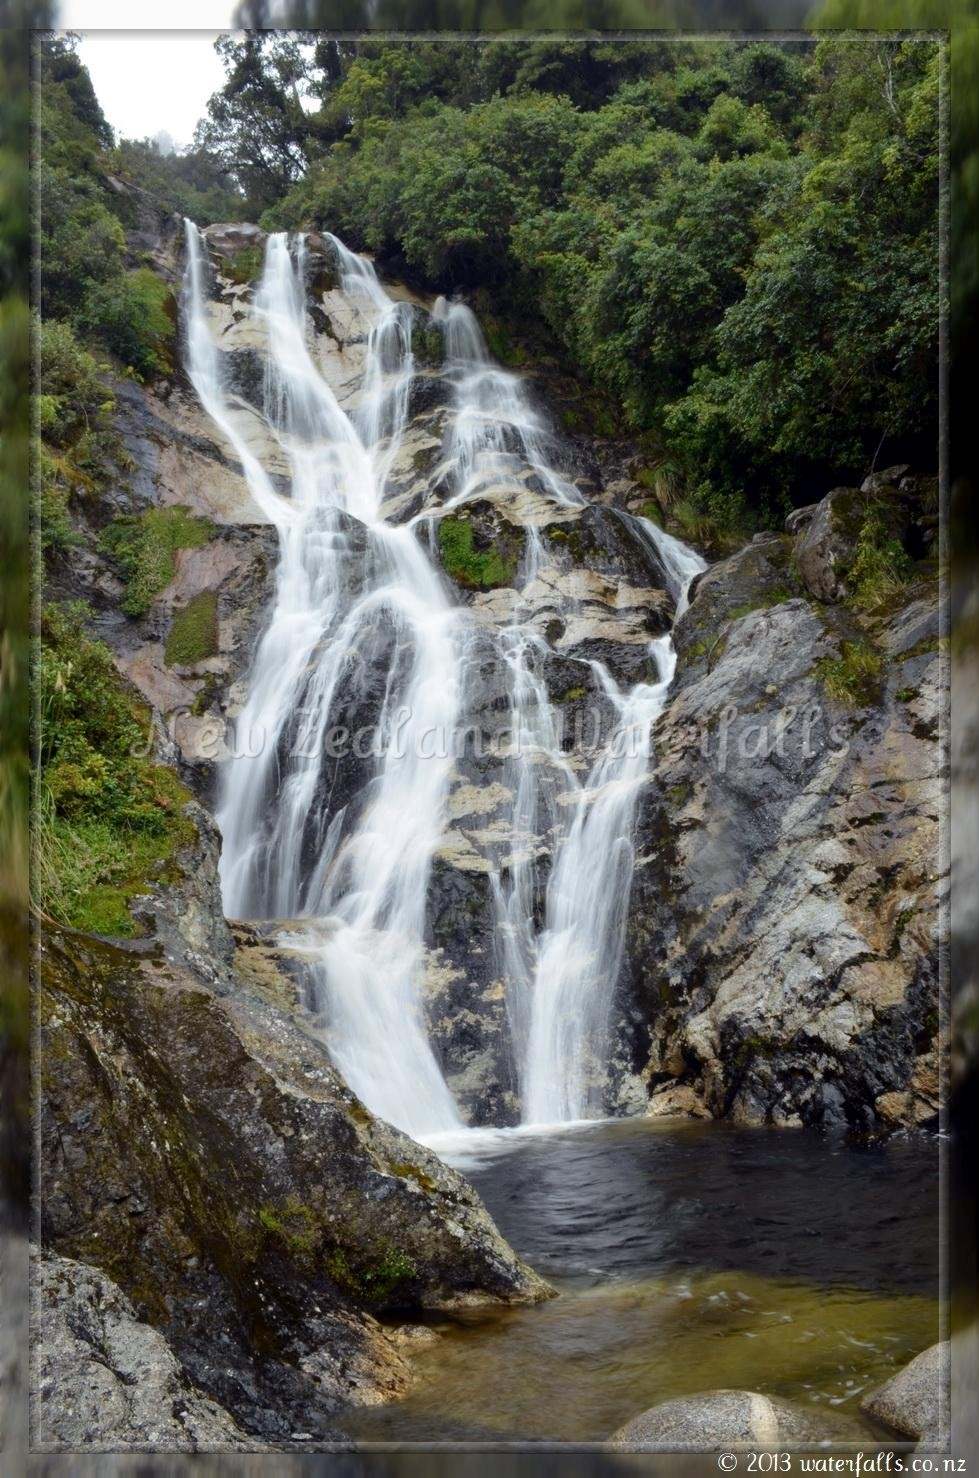 Carew Falls